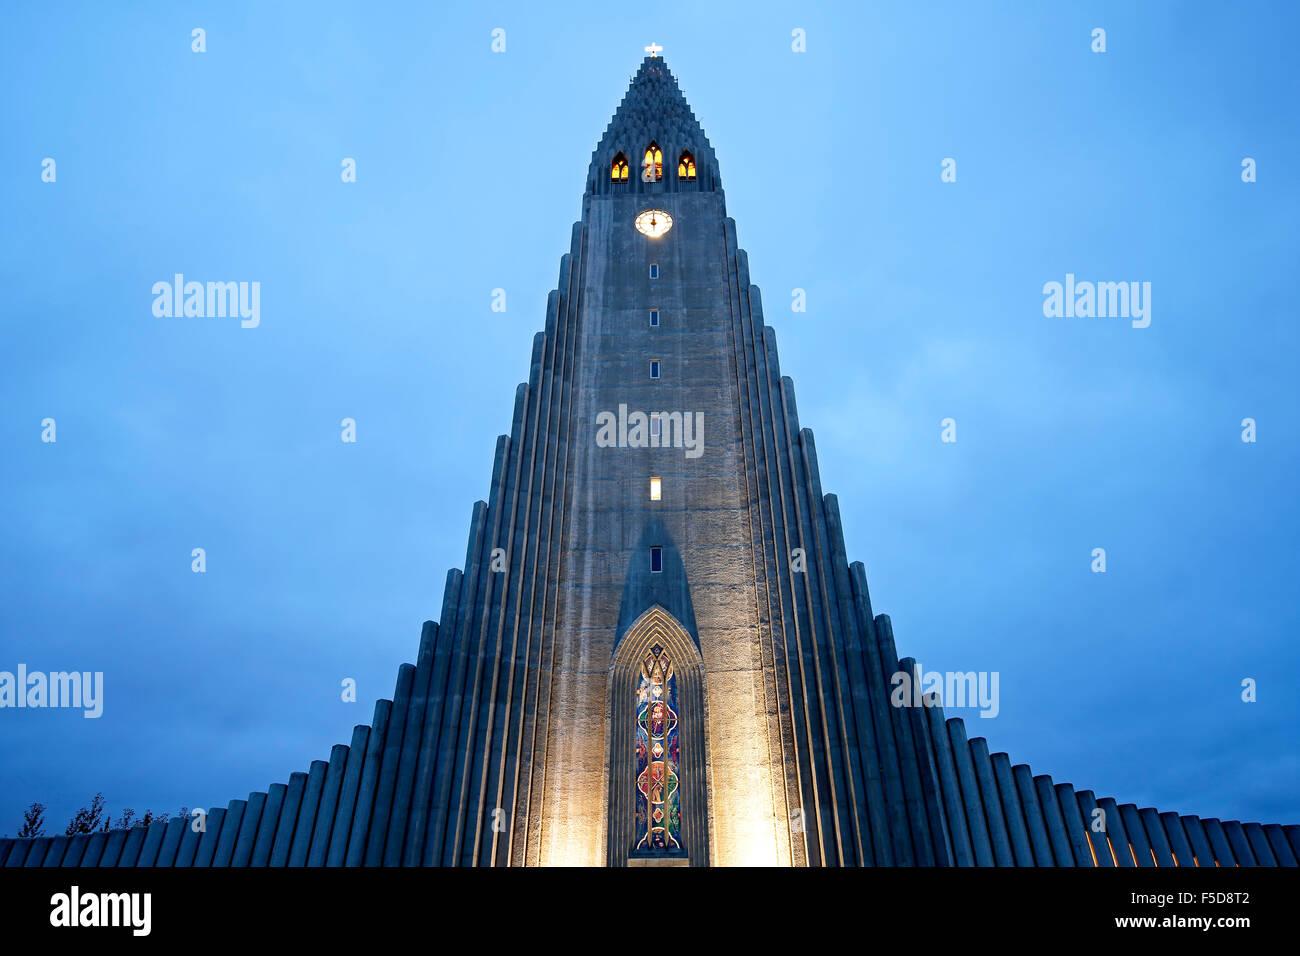 Chiesa Hallgrims (Hallgrimskirkja dallo stato architetto Guðjón Samúelsson), Reykjavik, Islanda Immagini Stock